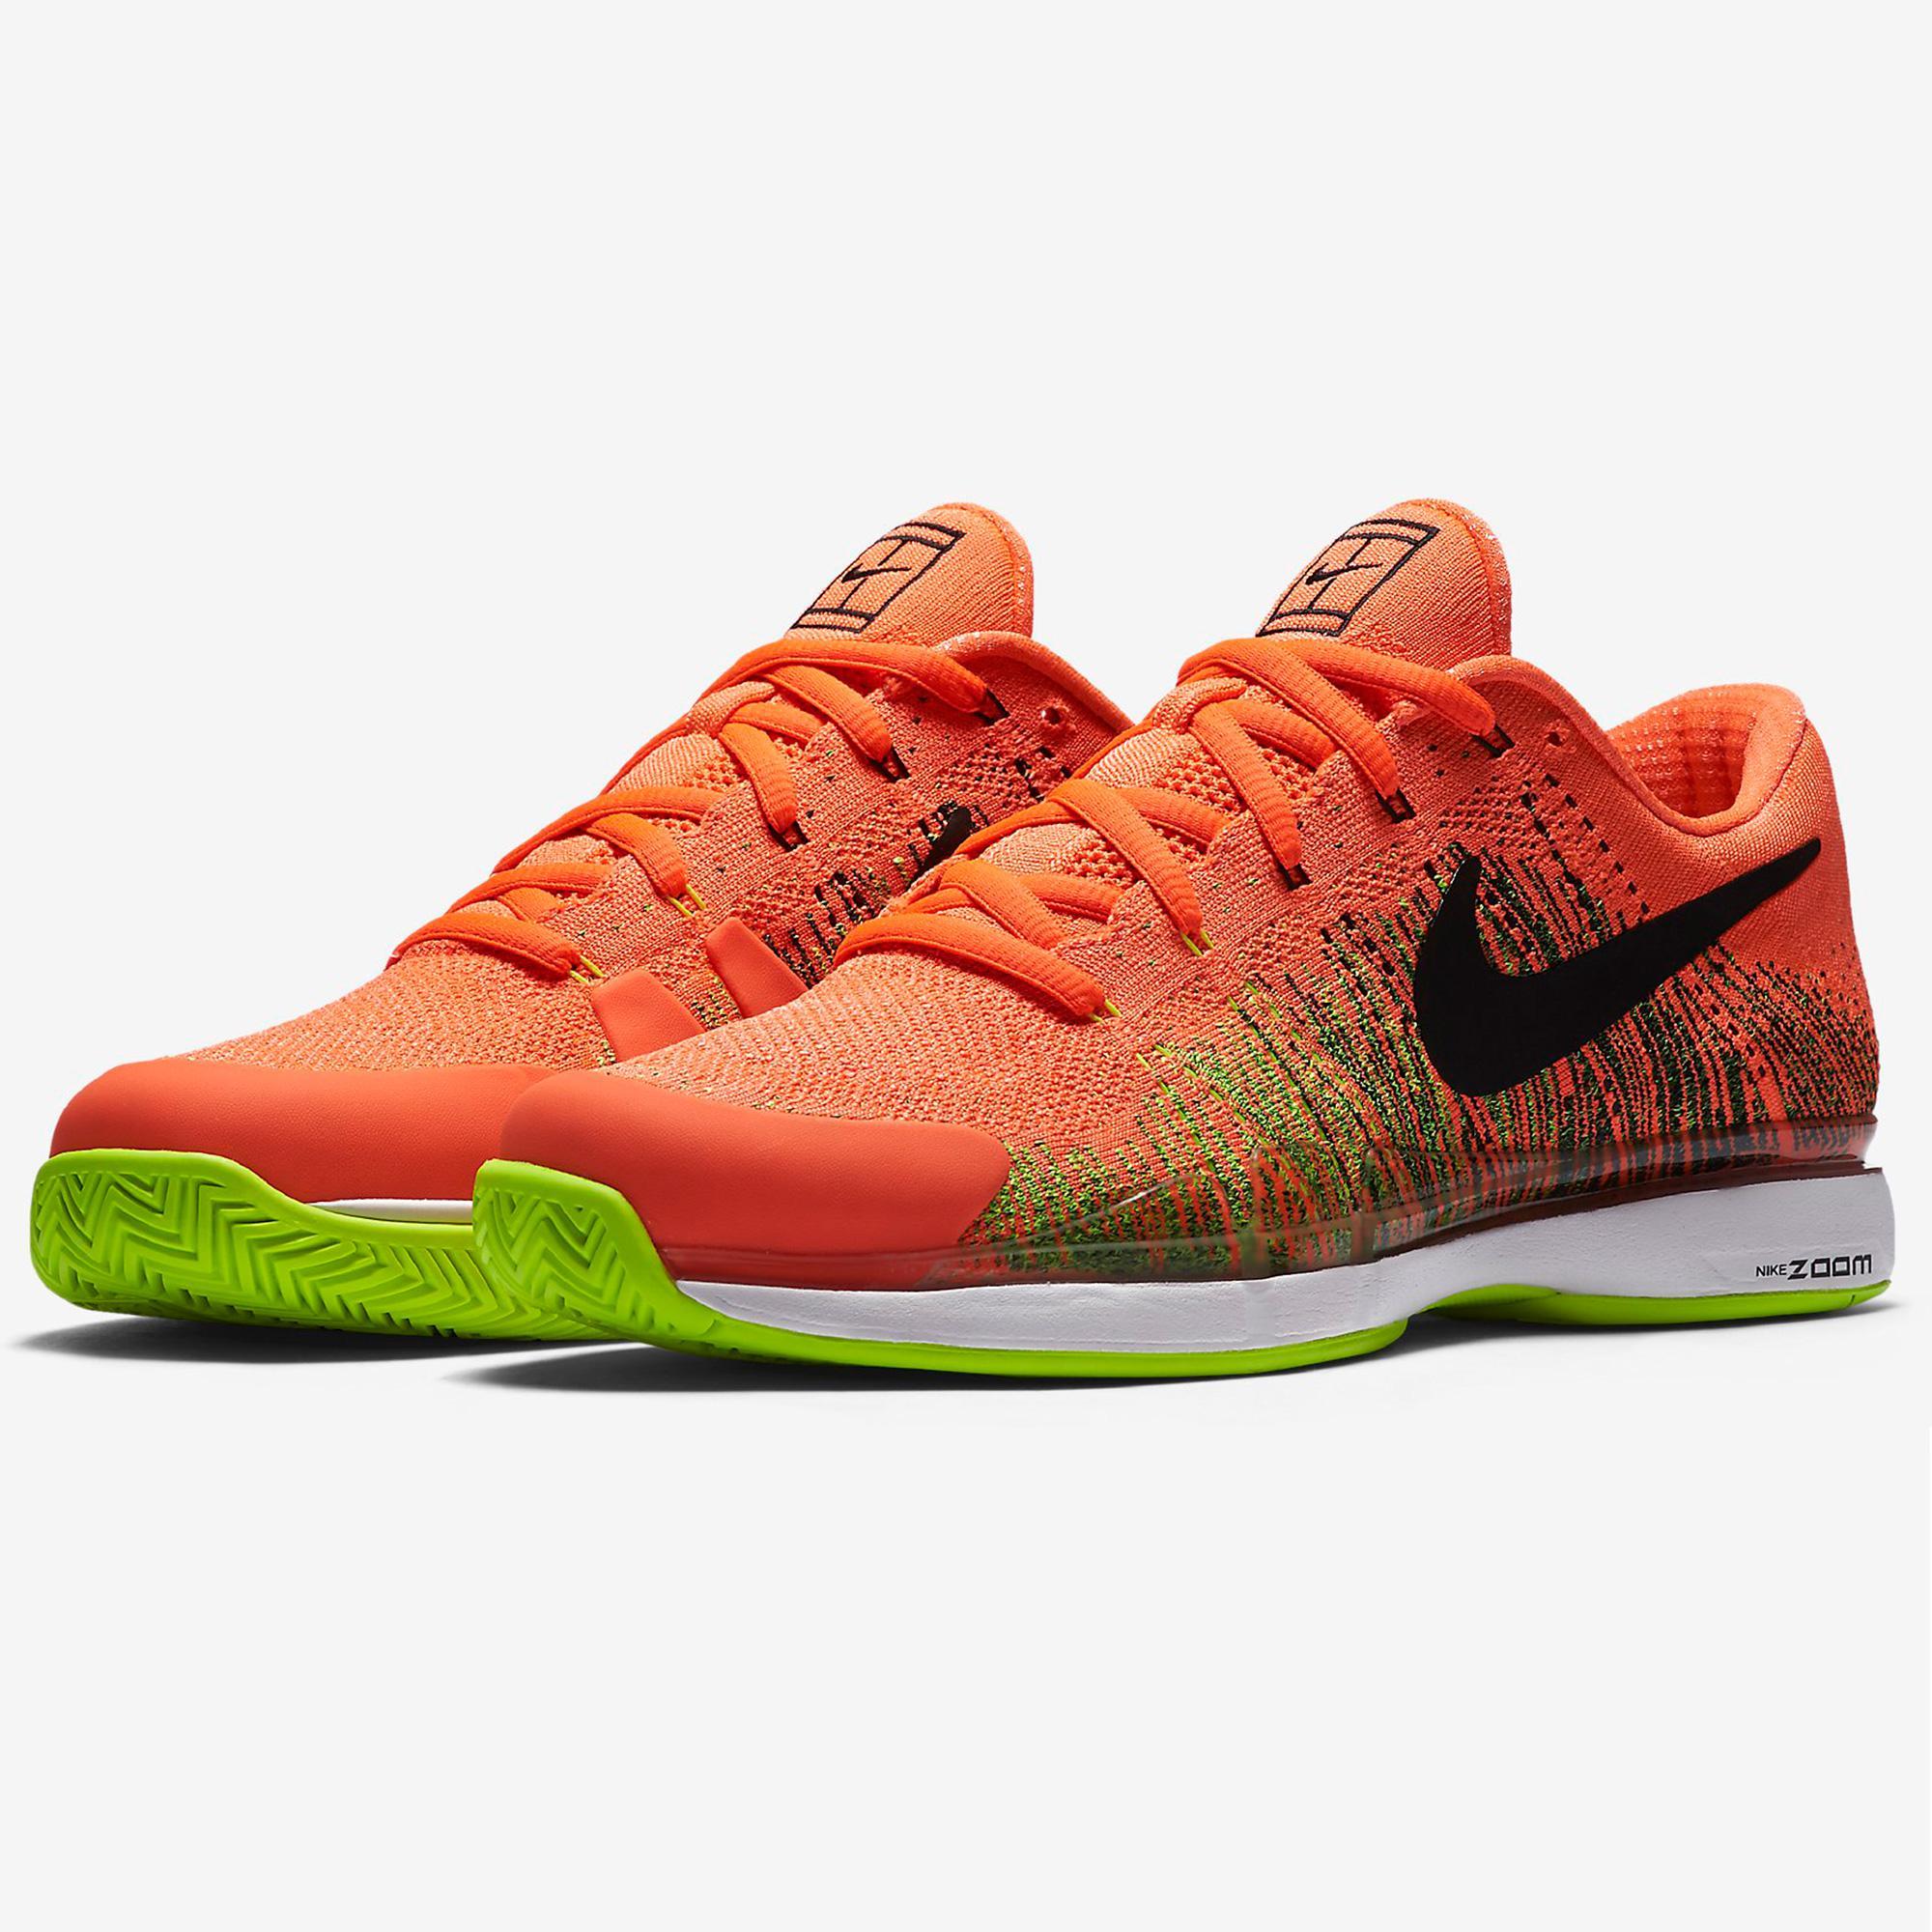 huge discount c5a85 a9a92 Nike Mens Zoom Vapor 9.5 Flyknit Tennis Shoes - Hyper Orange